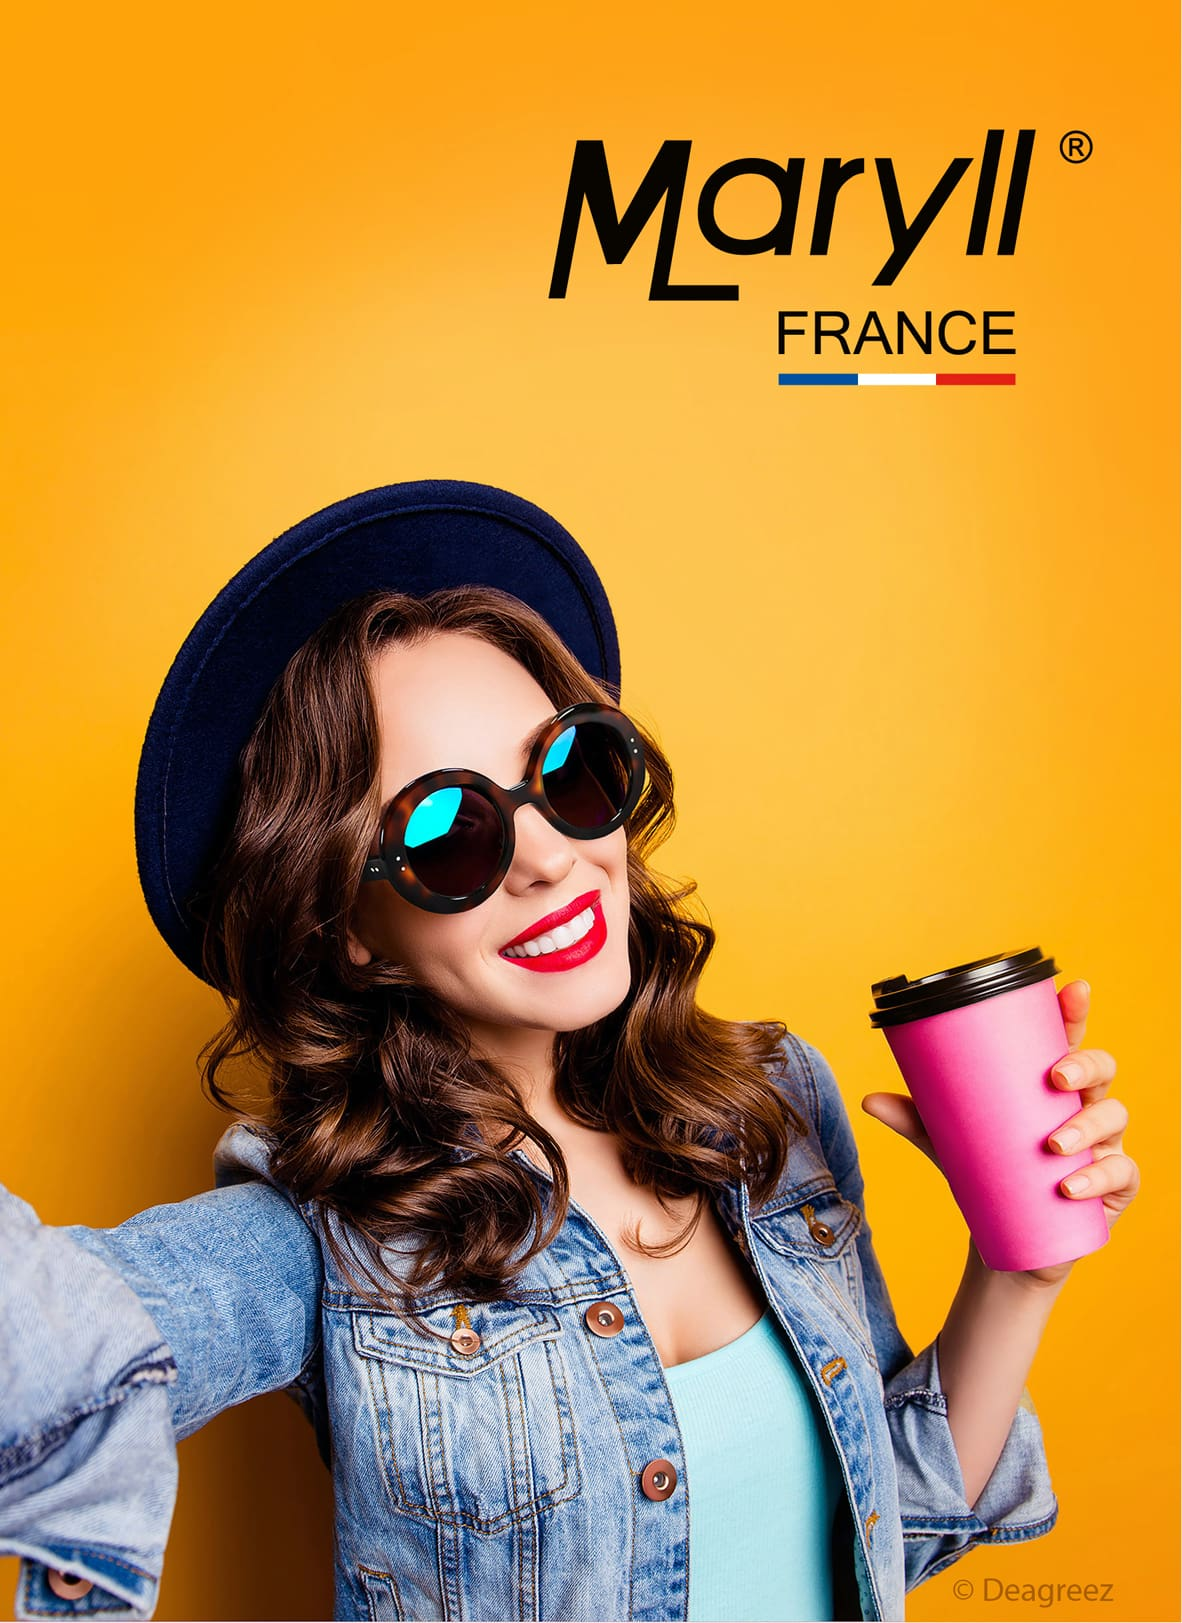 la marque Maryll France